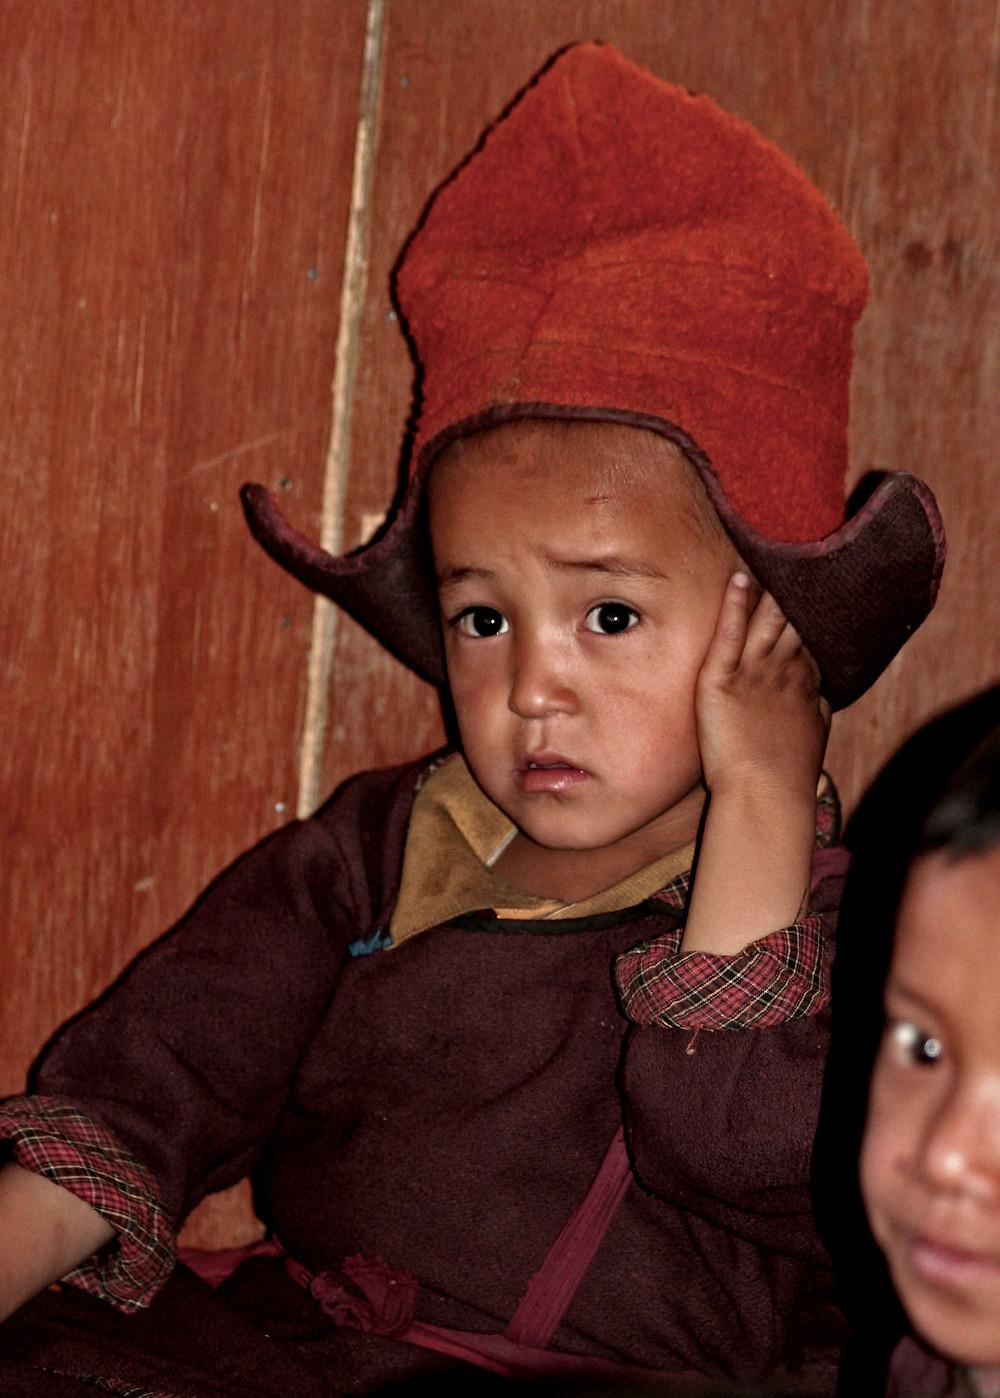 Bambino a lezione di filosofia al Karsha monastery (Zanskar valley, Ladakh – India, agosto 2013)